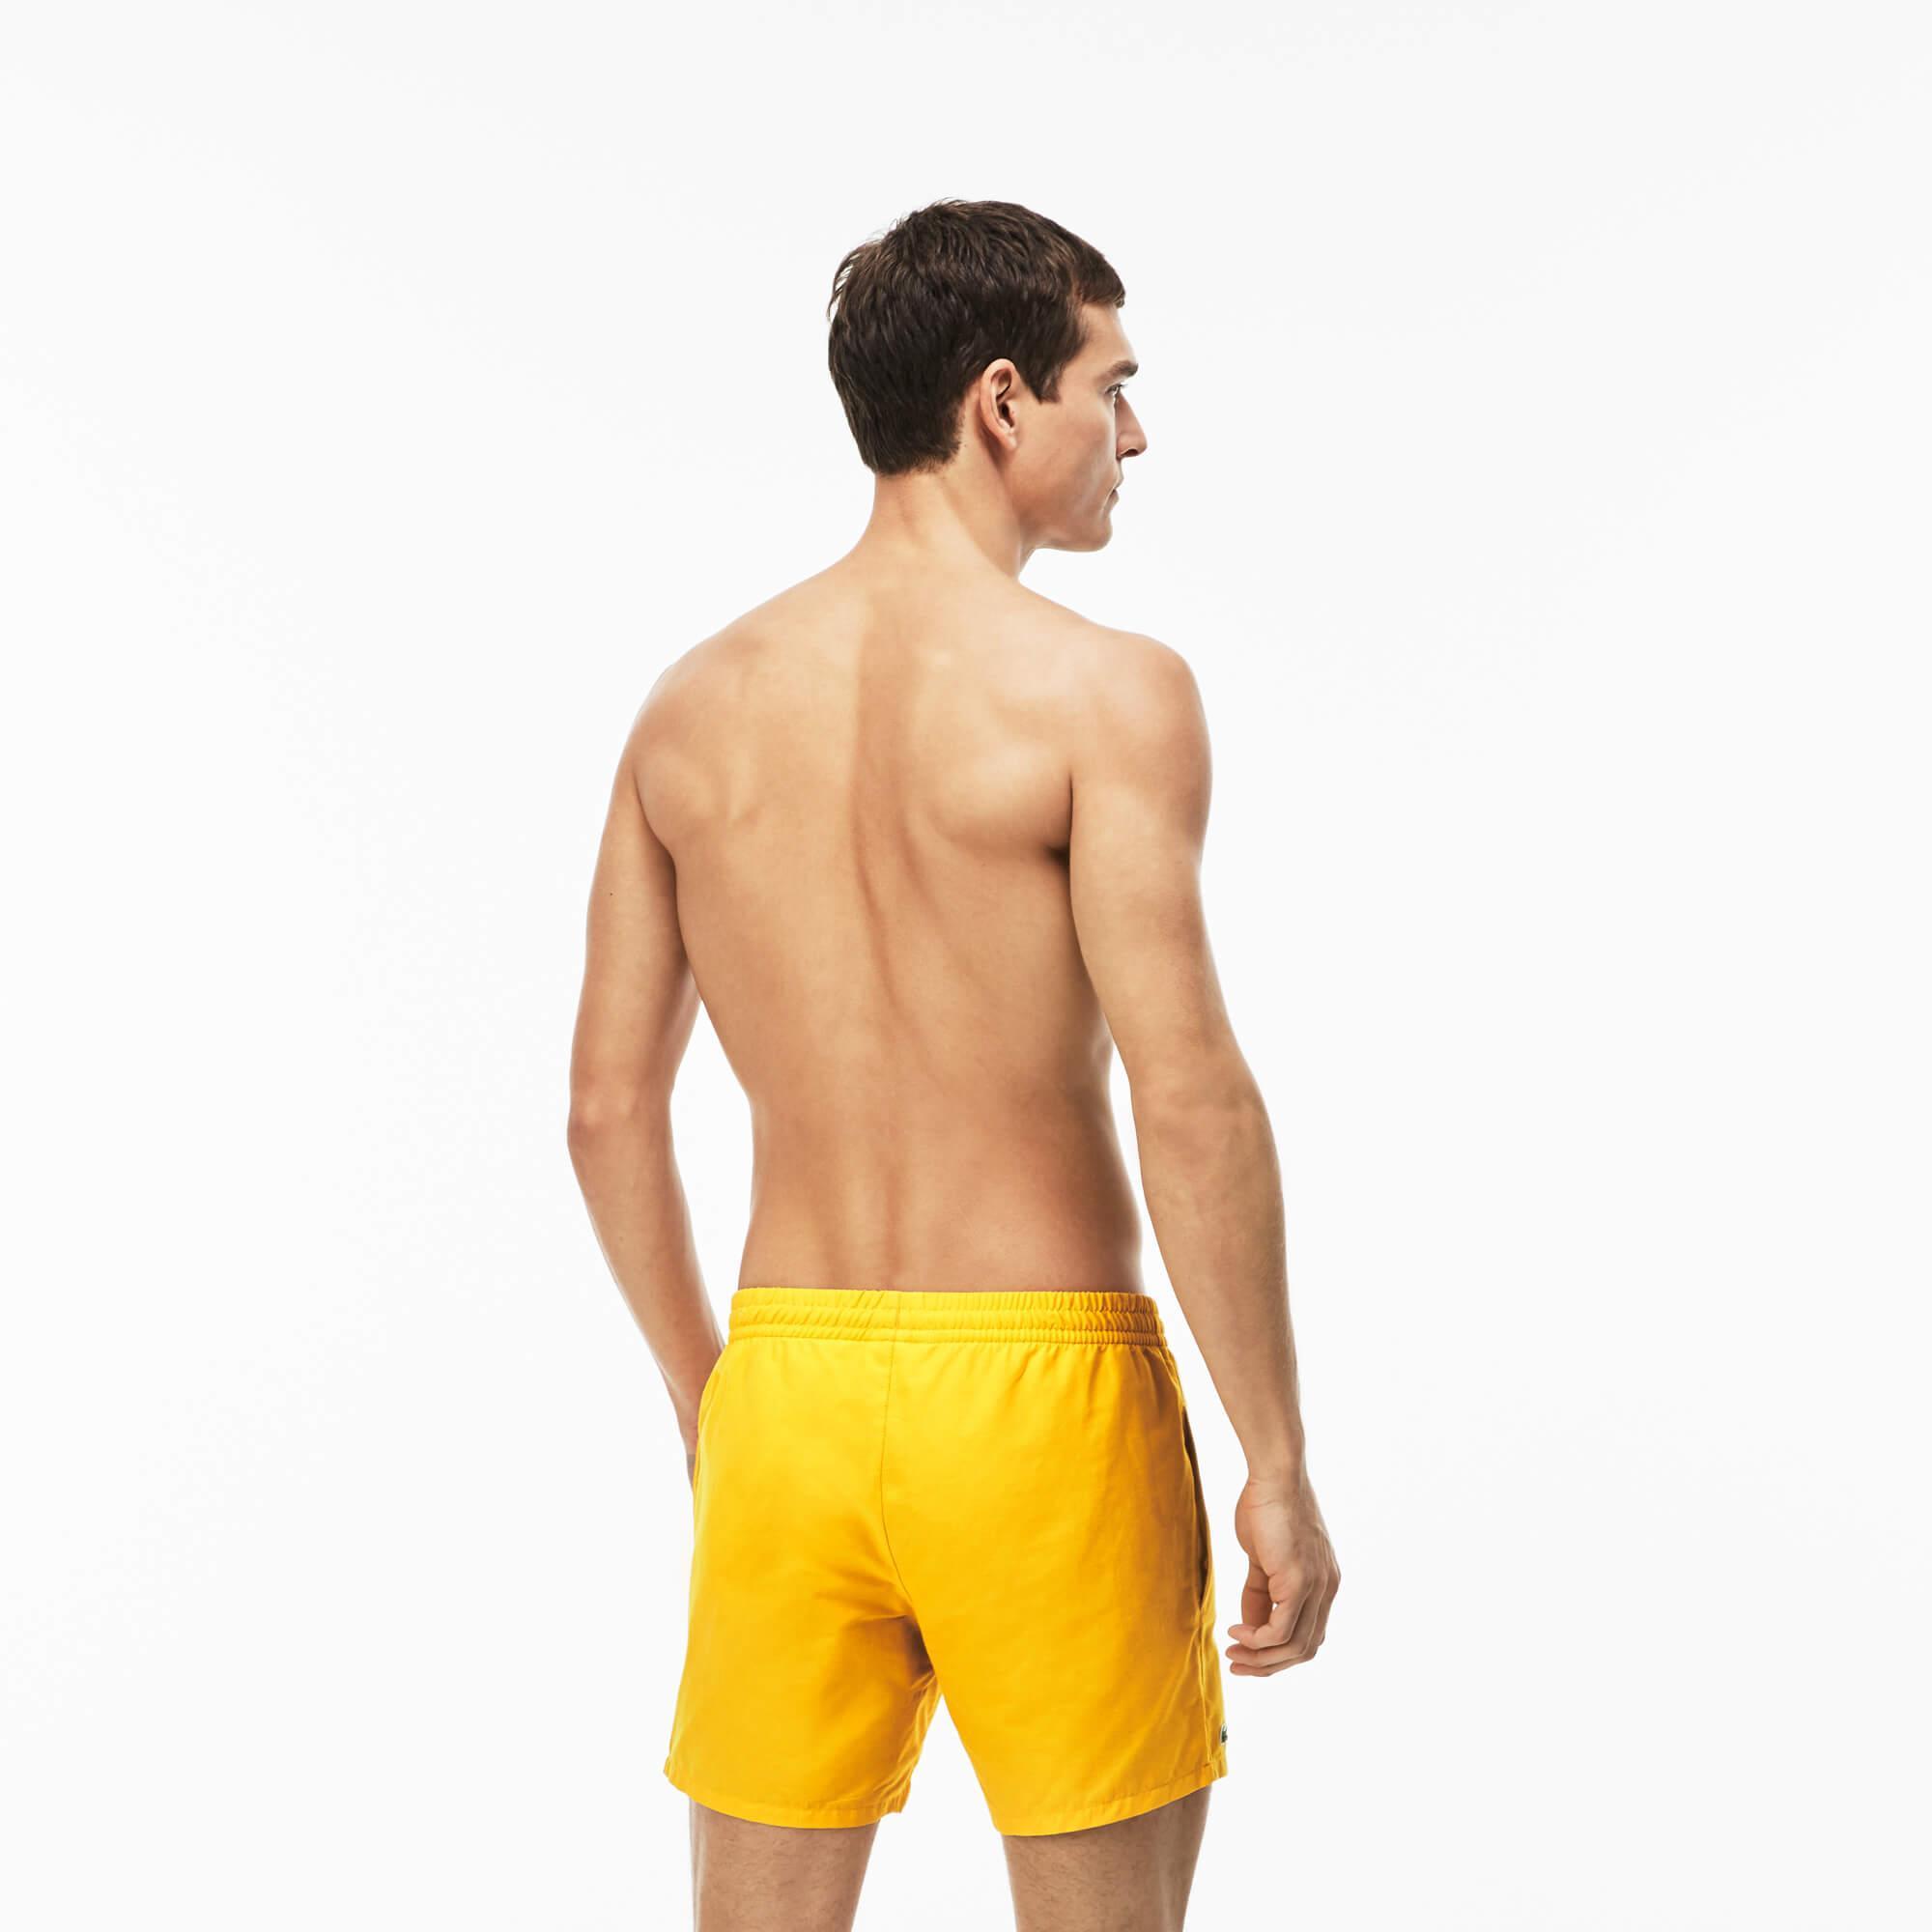 Lacoste Men's Swimming Trunks İn Taffeta